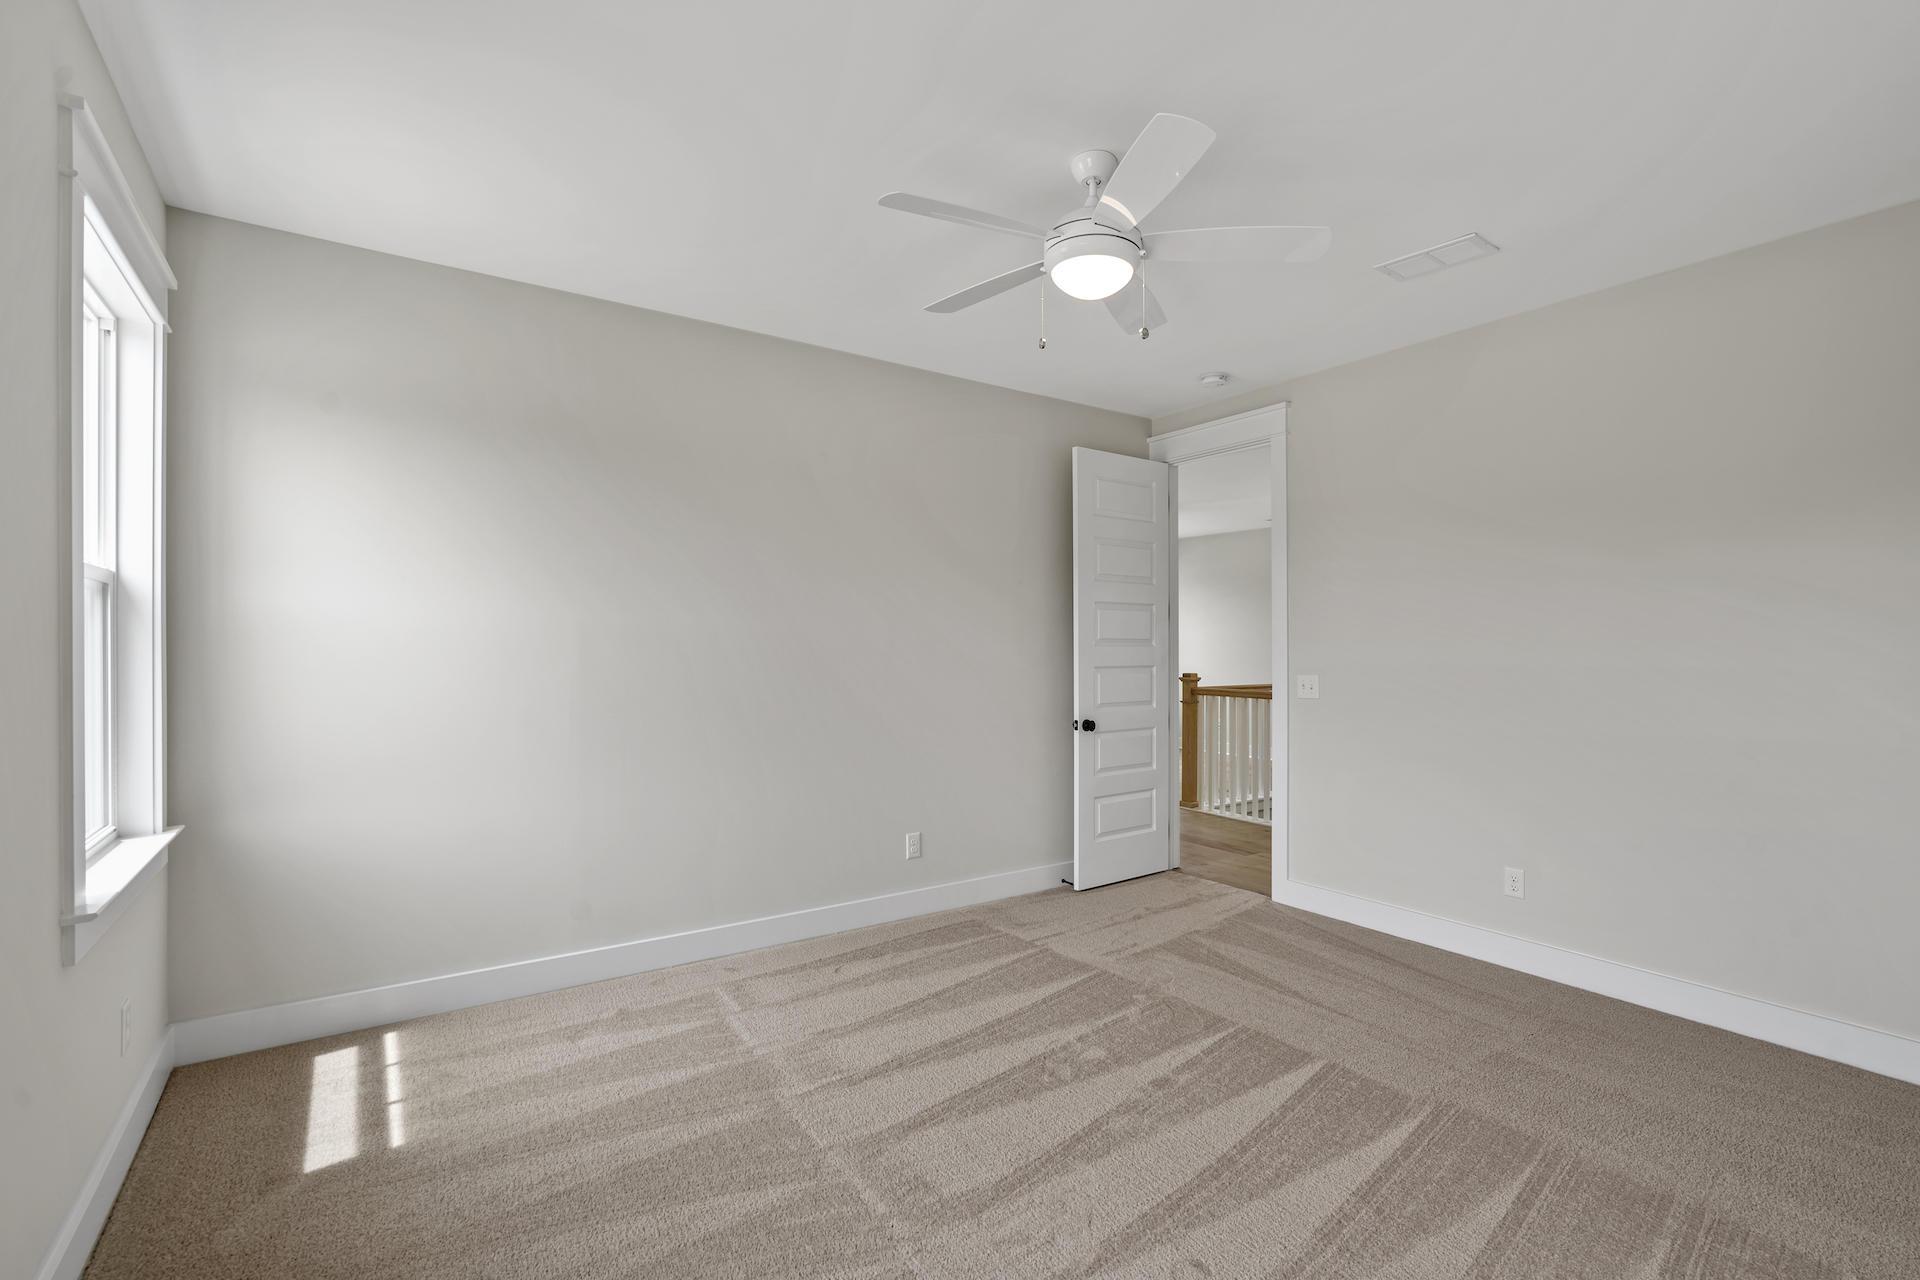 Midtown Homes For Sale - 1320 Upper Union, Mount Pleasant, SC - 15